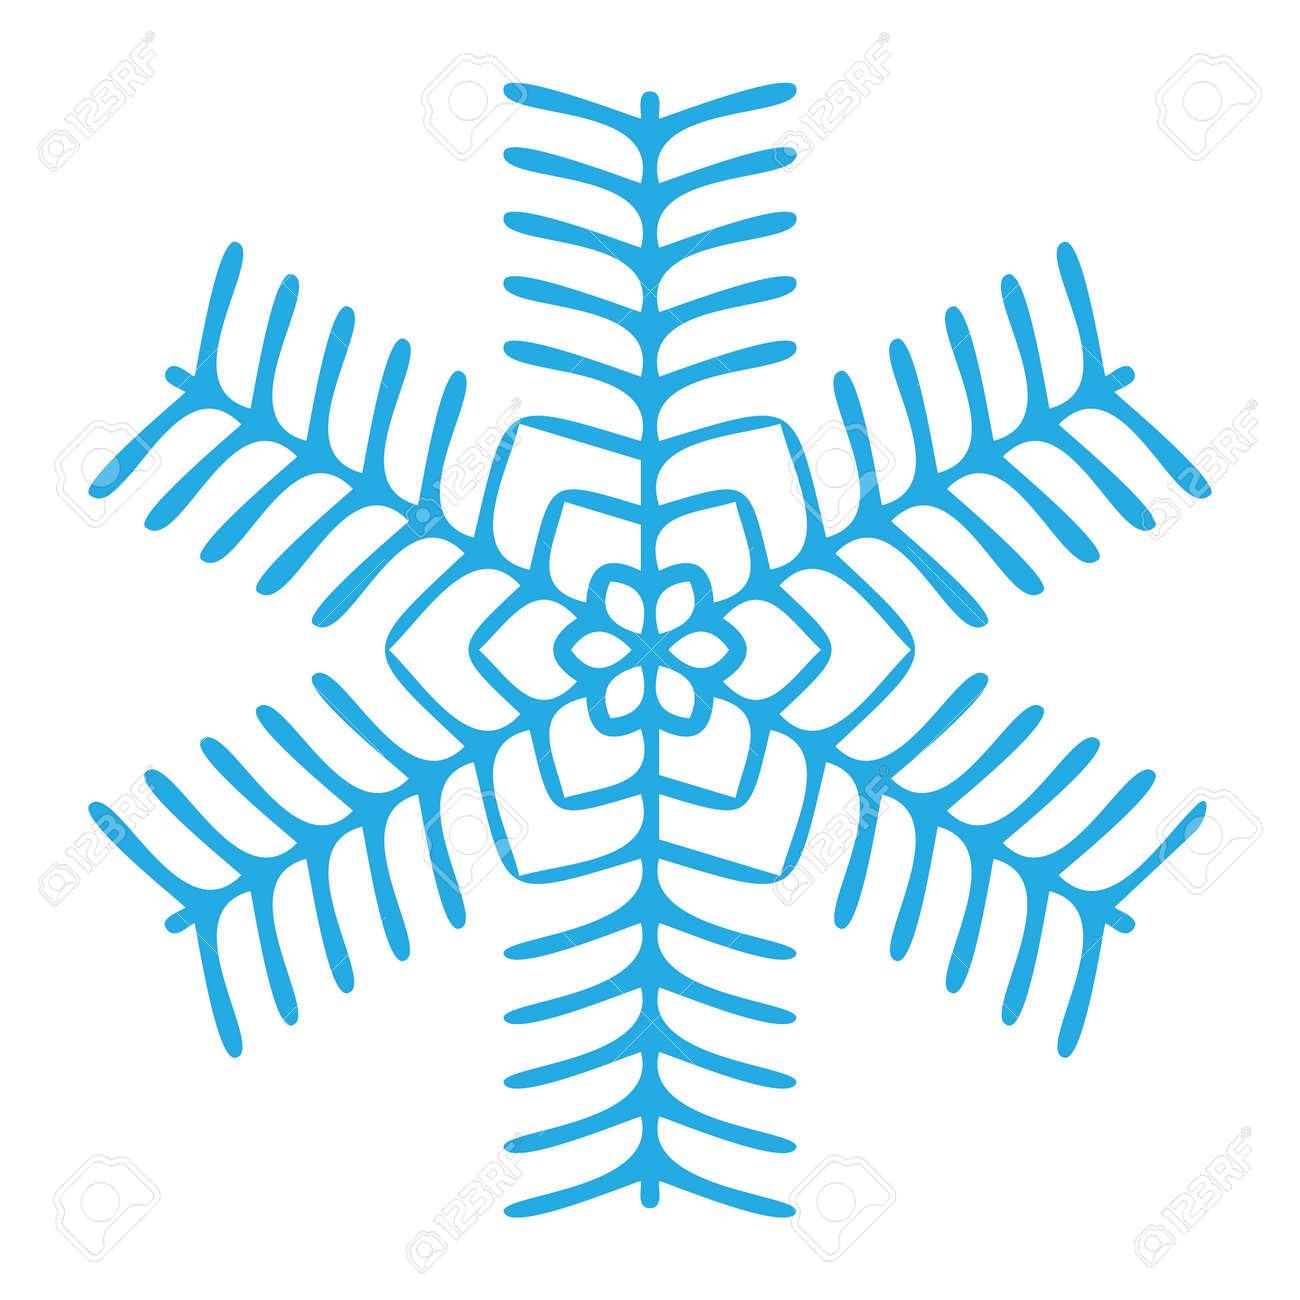 Snowflake winter blue symbol icon. Vector illustration graphic design Stock Photo - 92433446